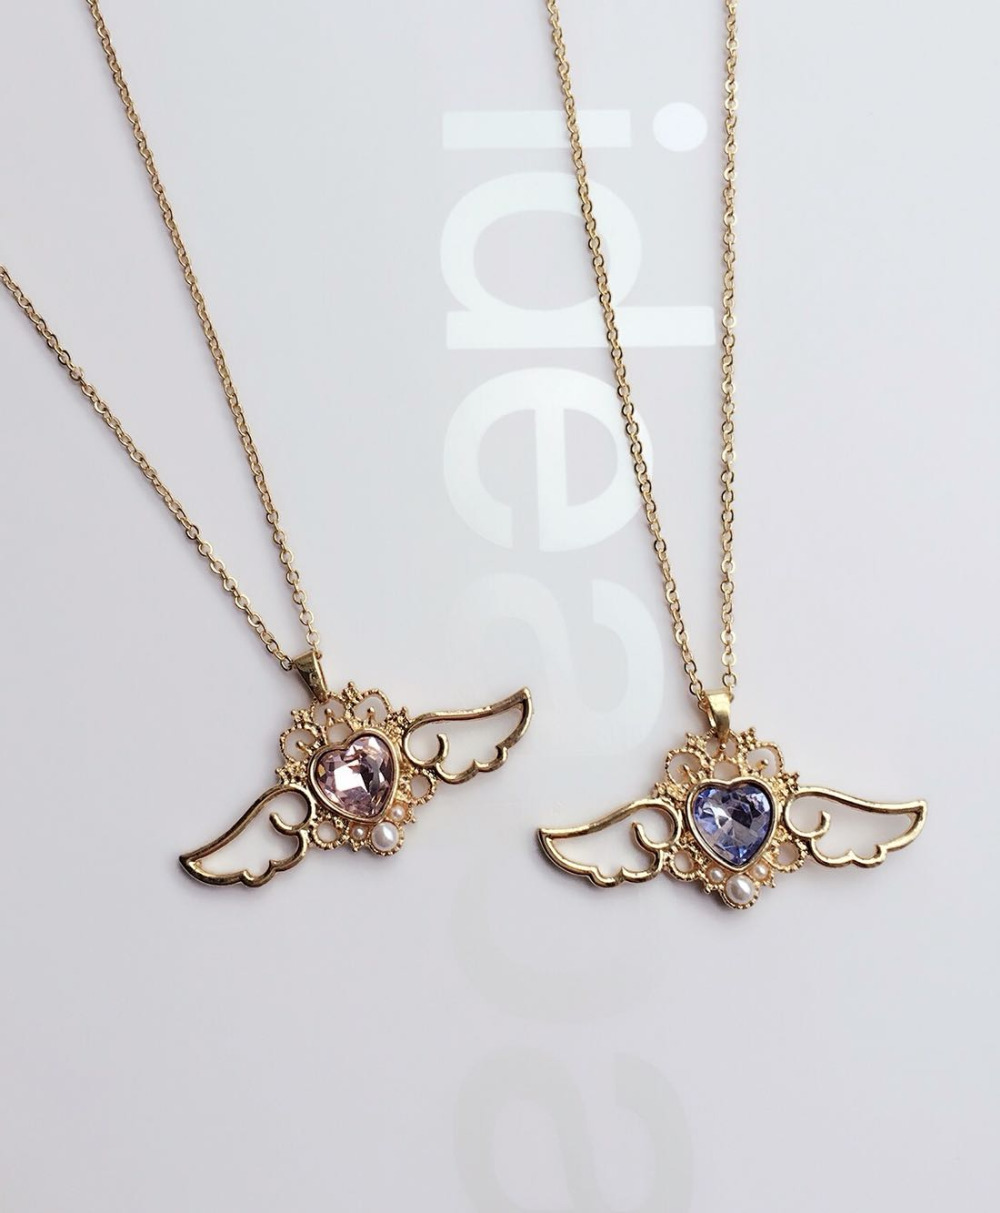 Sailor Moon Queen Serenity Glass Cameo Necklace